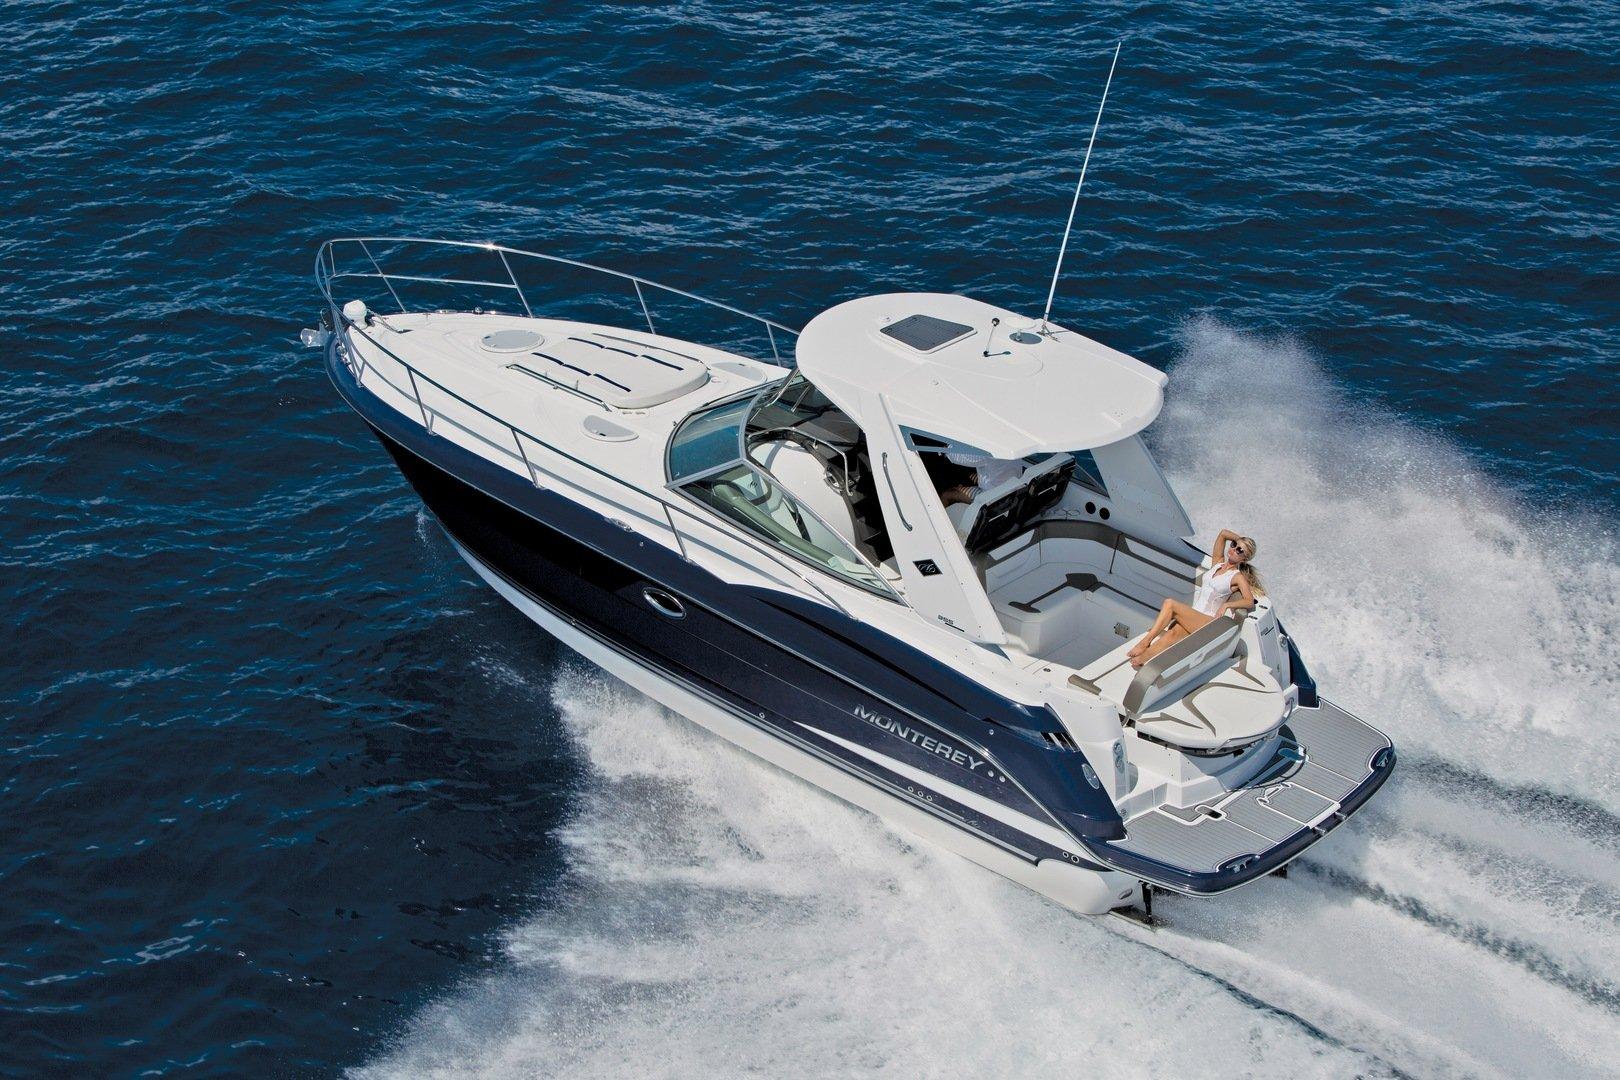 monterey-cruiser-yacht-355SY